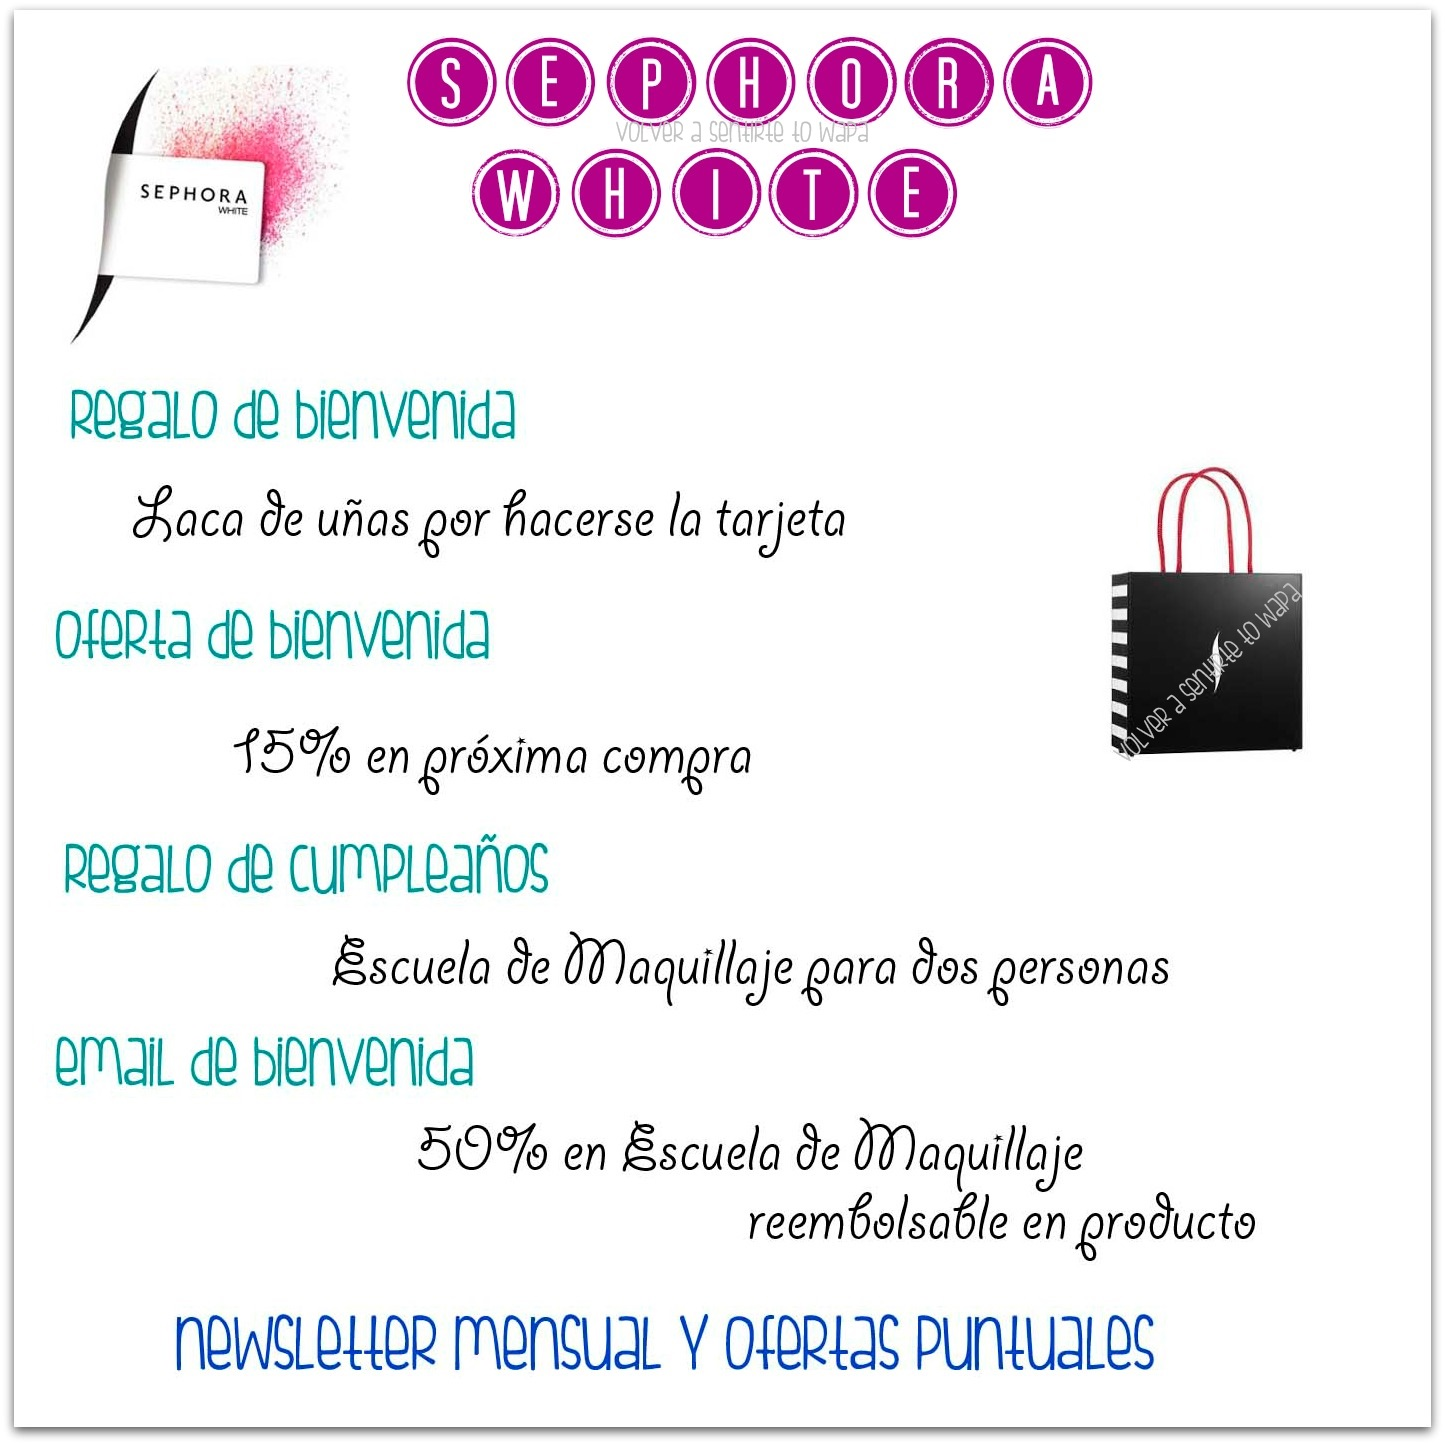 Tarjeta Sephora White - Beneficios y Ventajas